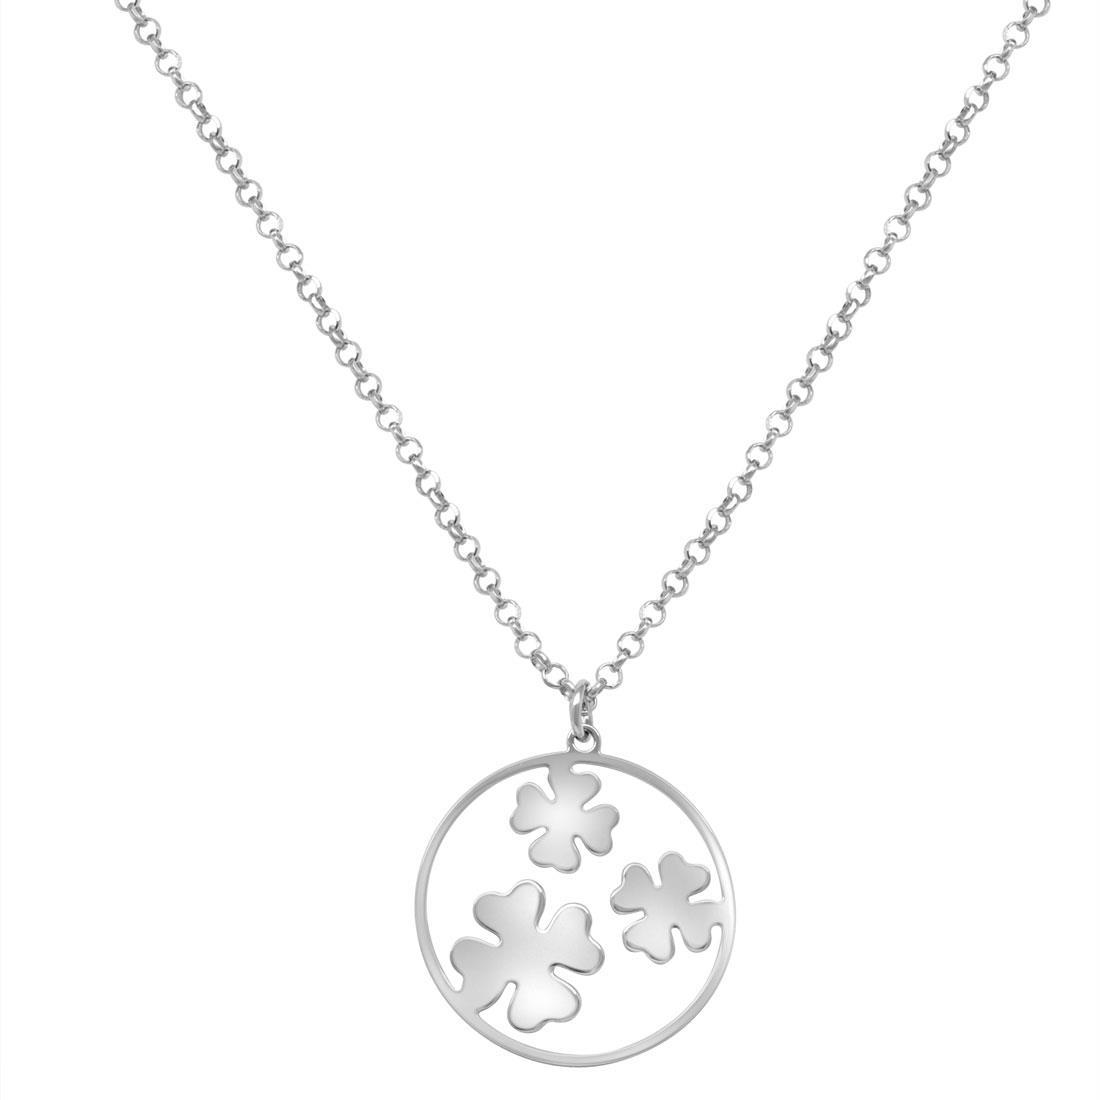 Collana in argento con pendente - ORO&CO